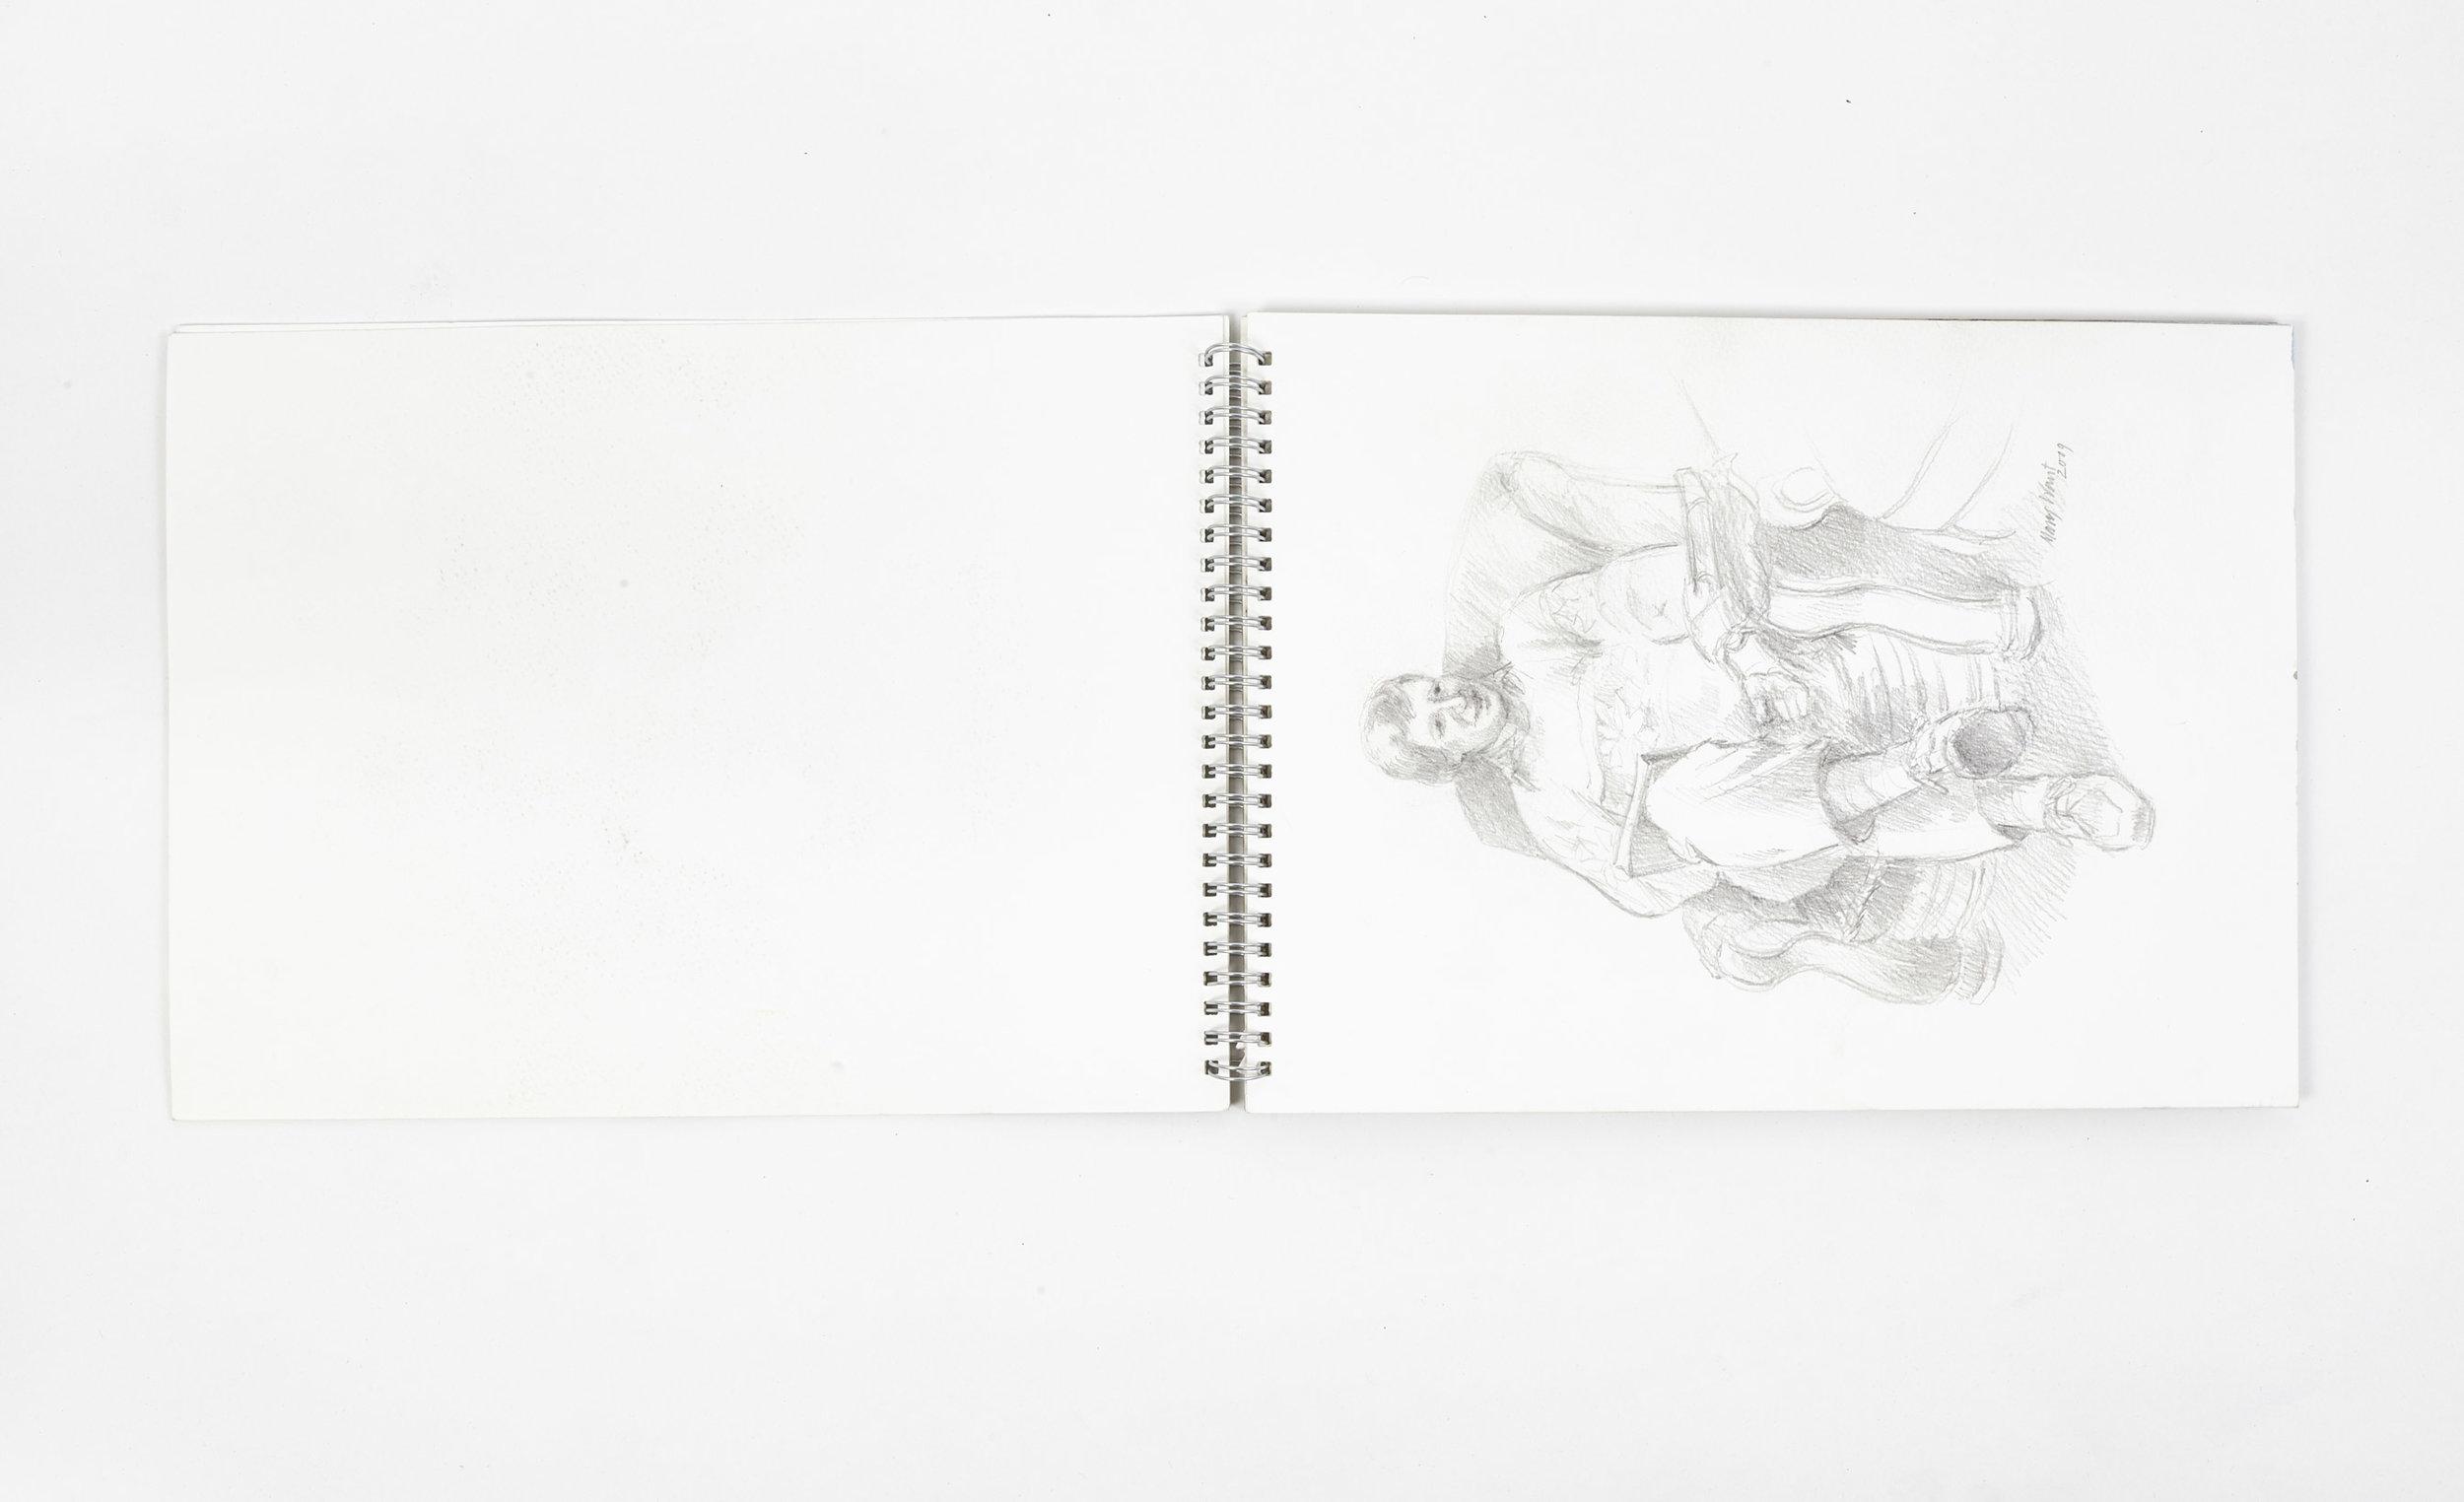 Mary Want_Sketchbooks_05.jpg